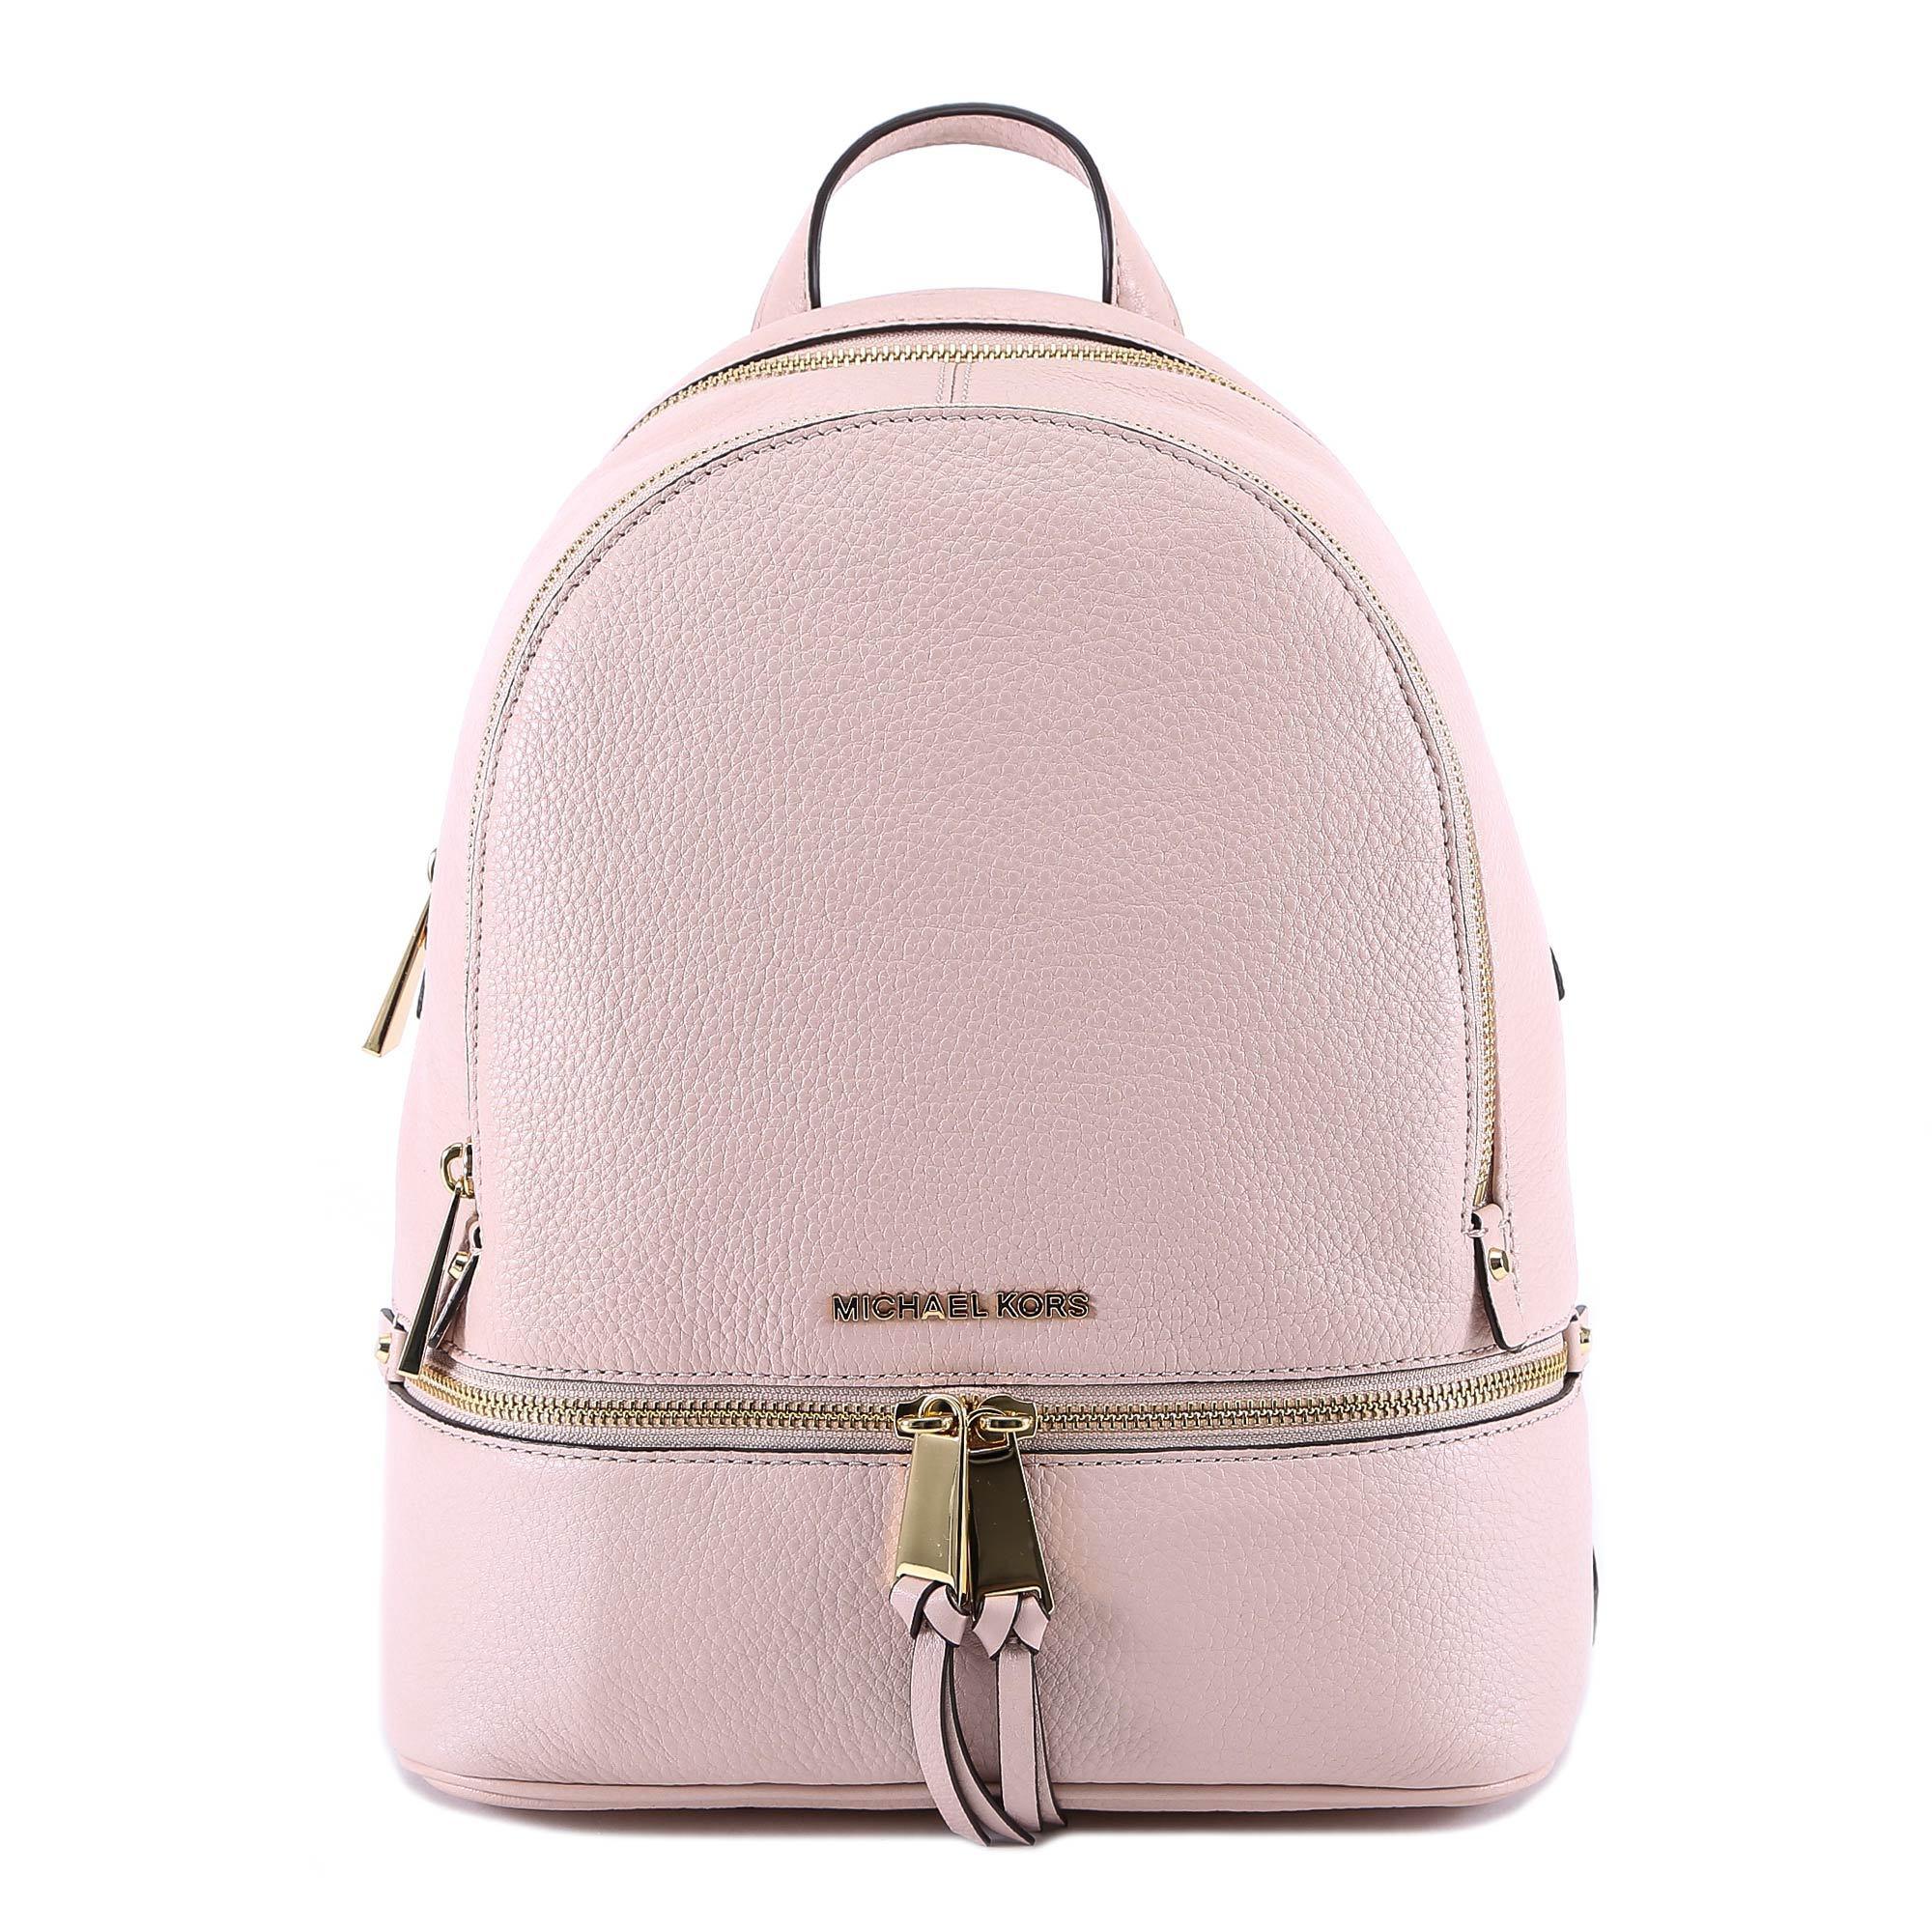 1a3d3c2bf7b9 Michael Michael Kors Small Rhea Backpack In Pink | ModeSens